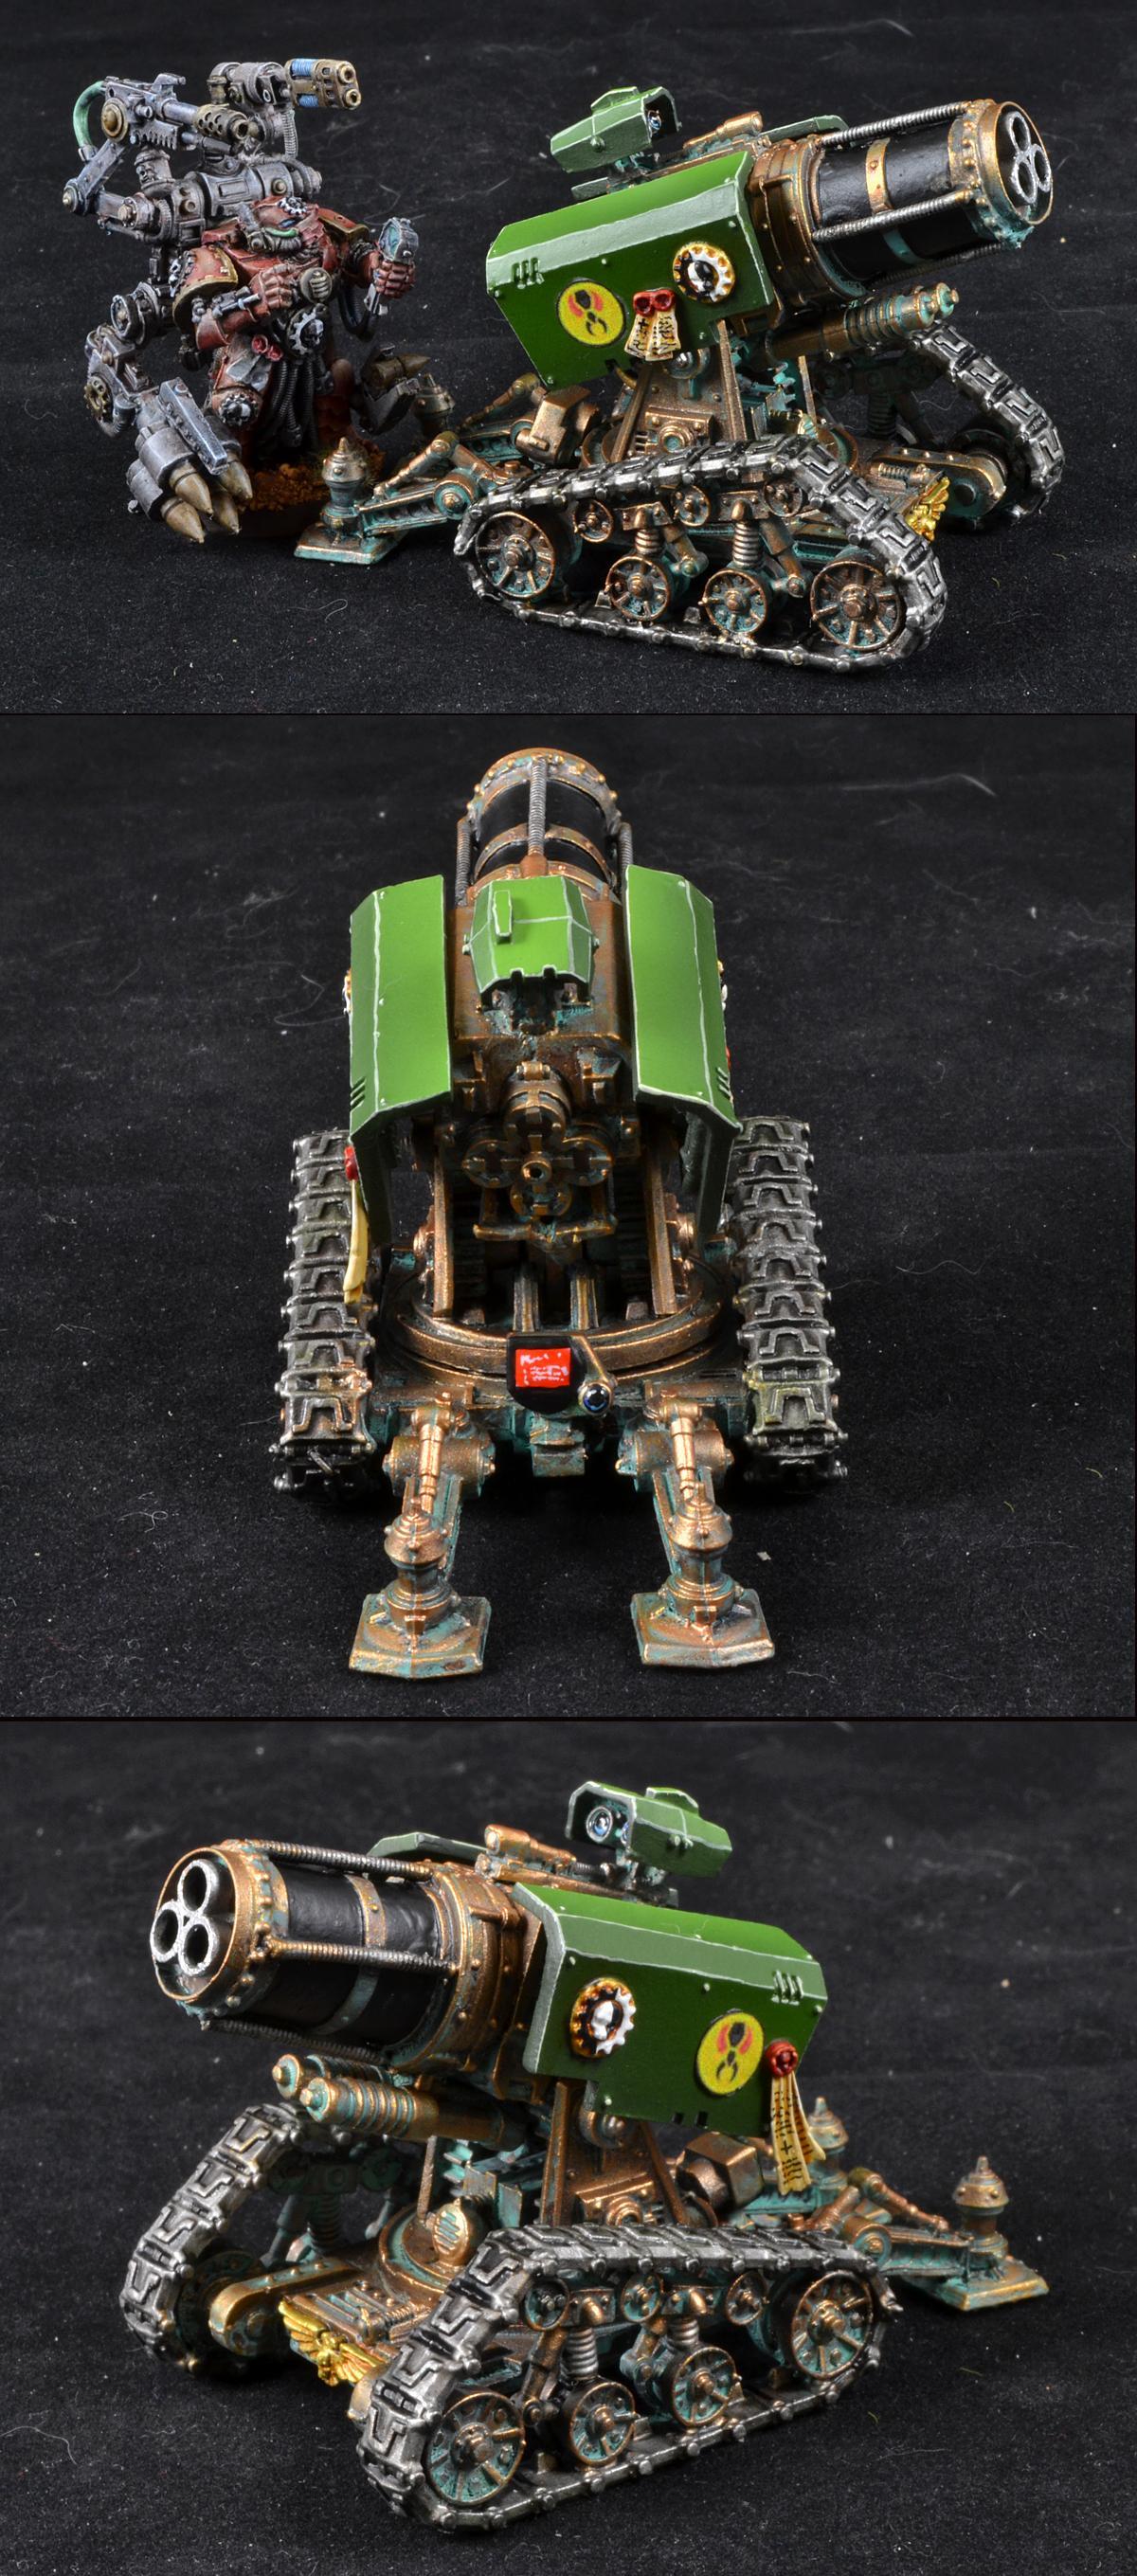 Mantis Warriors, Space Marines, Thunderfire Cannon, Warhammer 40,000